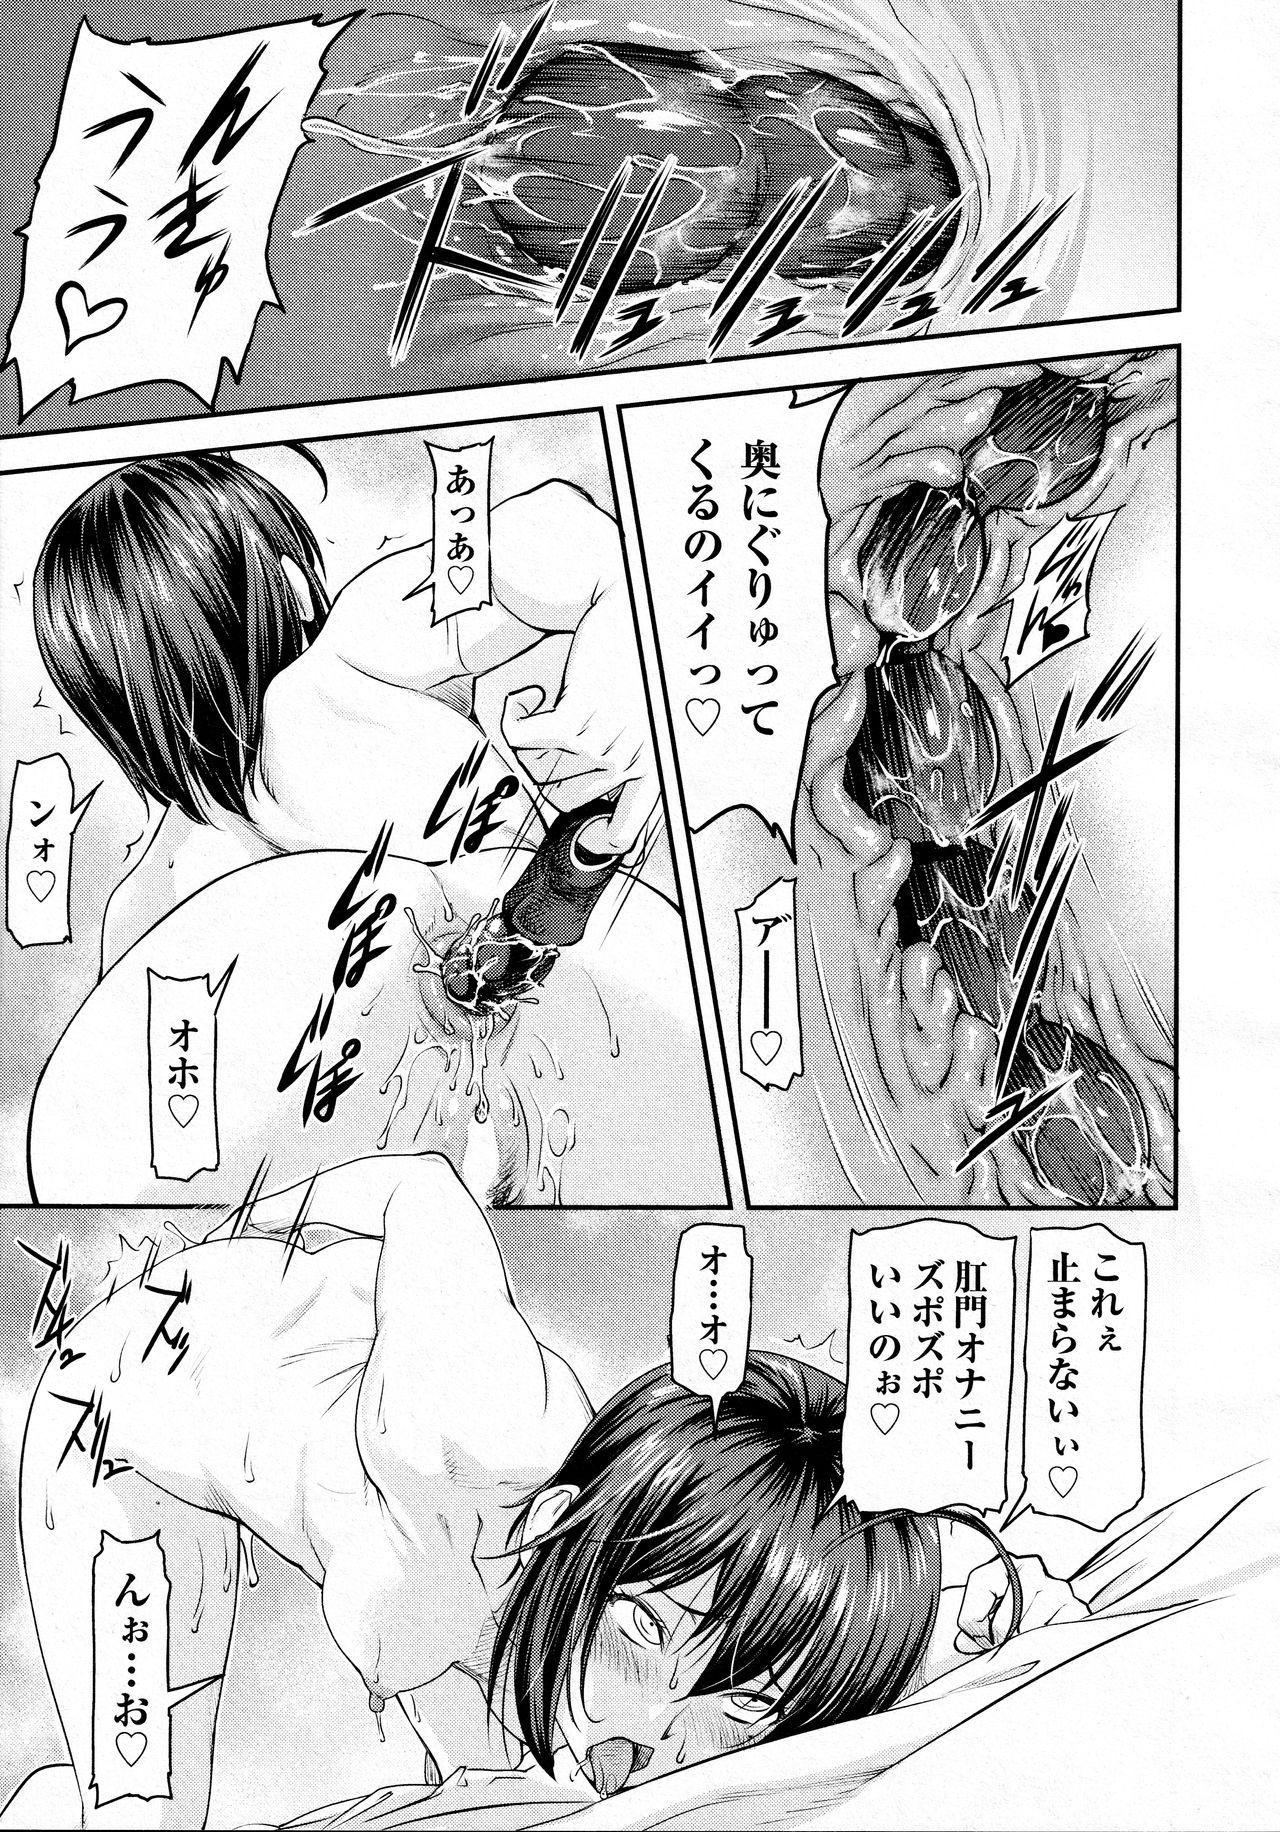 Kaname Date #11 22